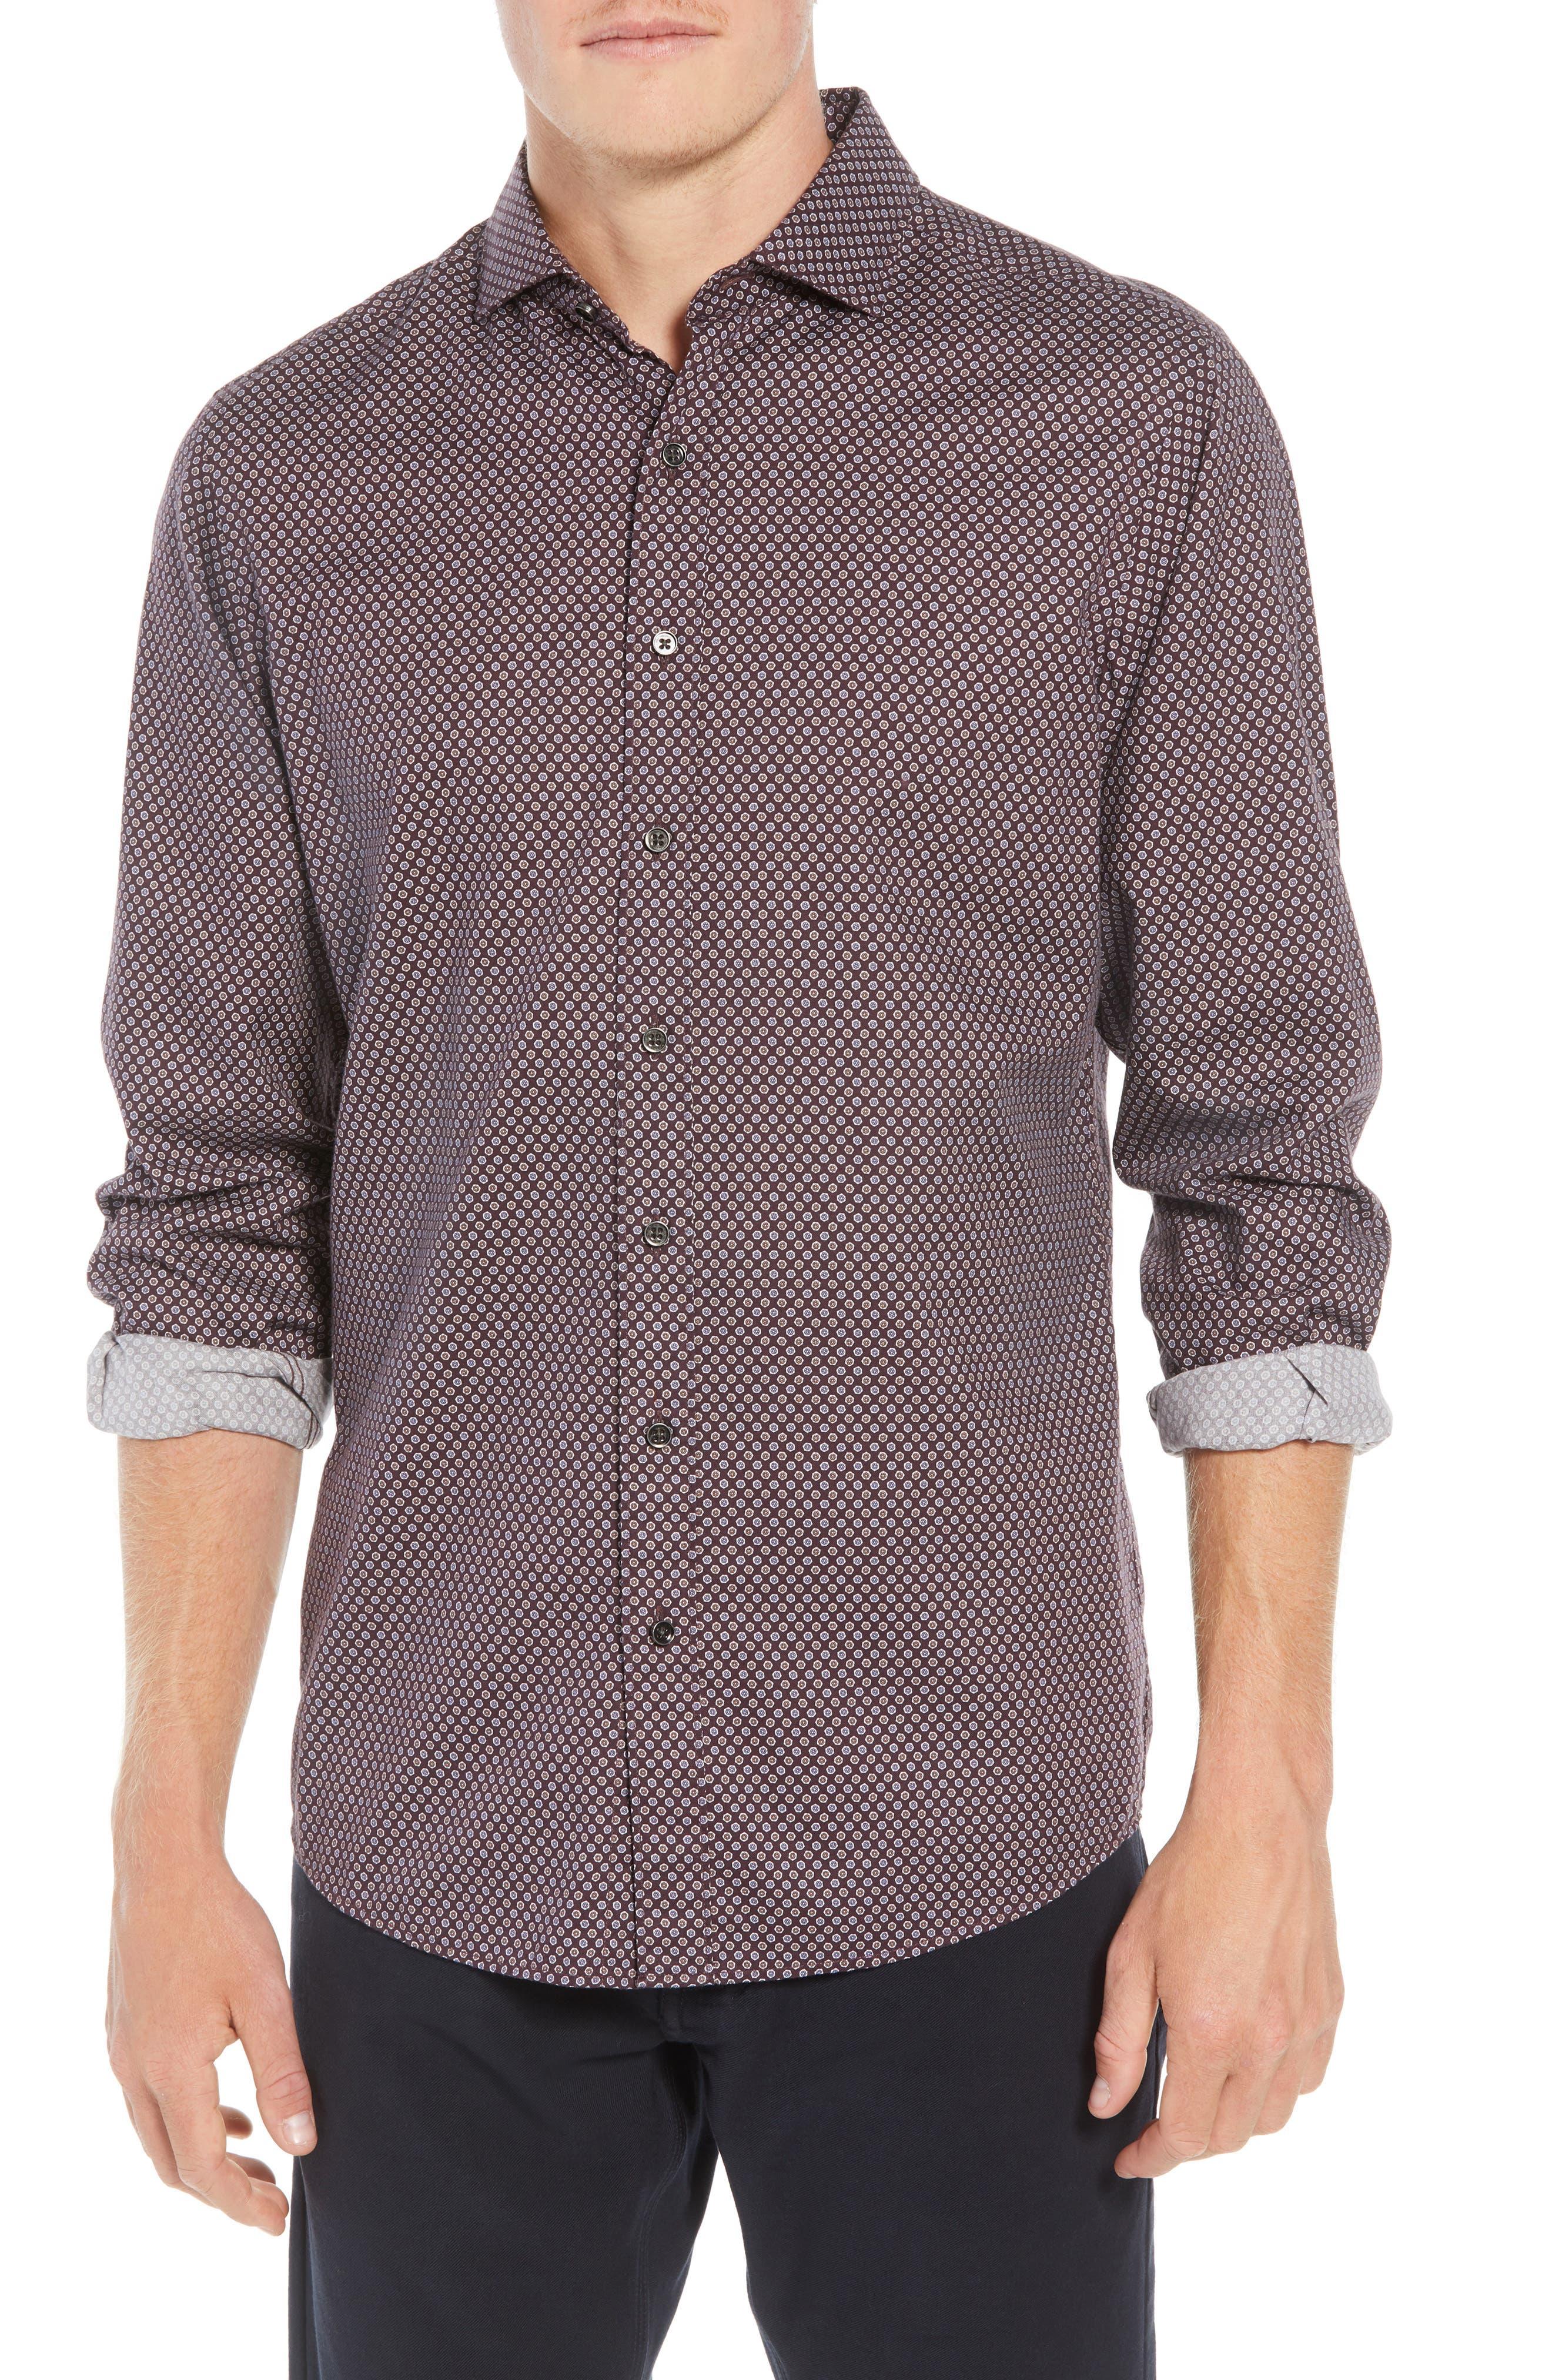 Marsden Bay Regular Fit Sport Shirt,                             Main thumbnail 1, color,                             BORDEAUX